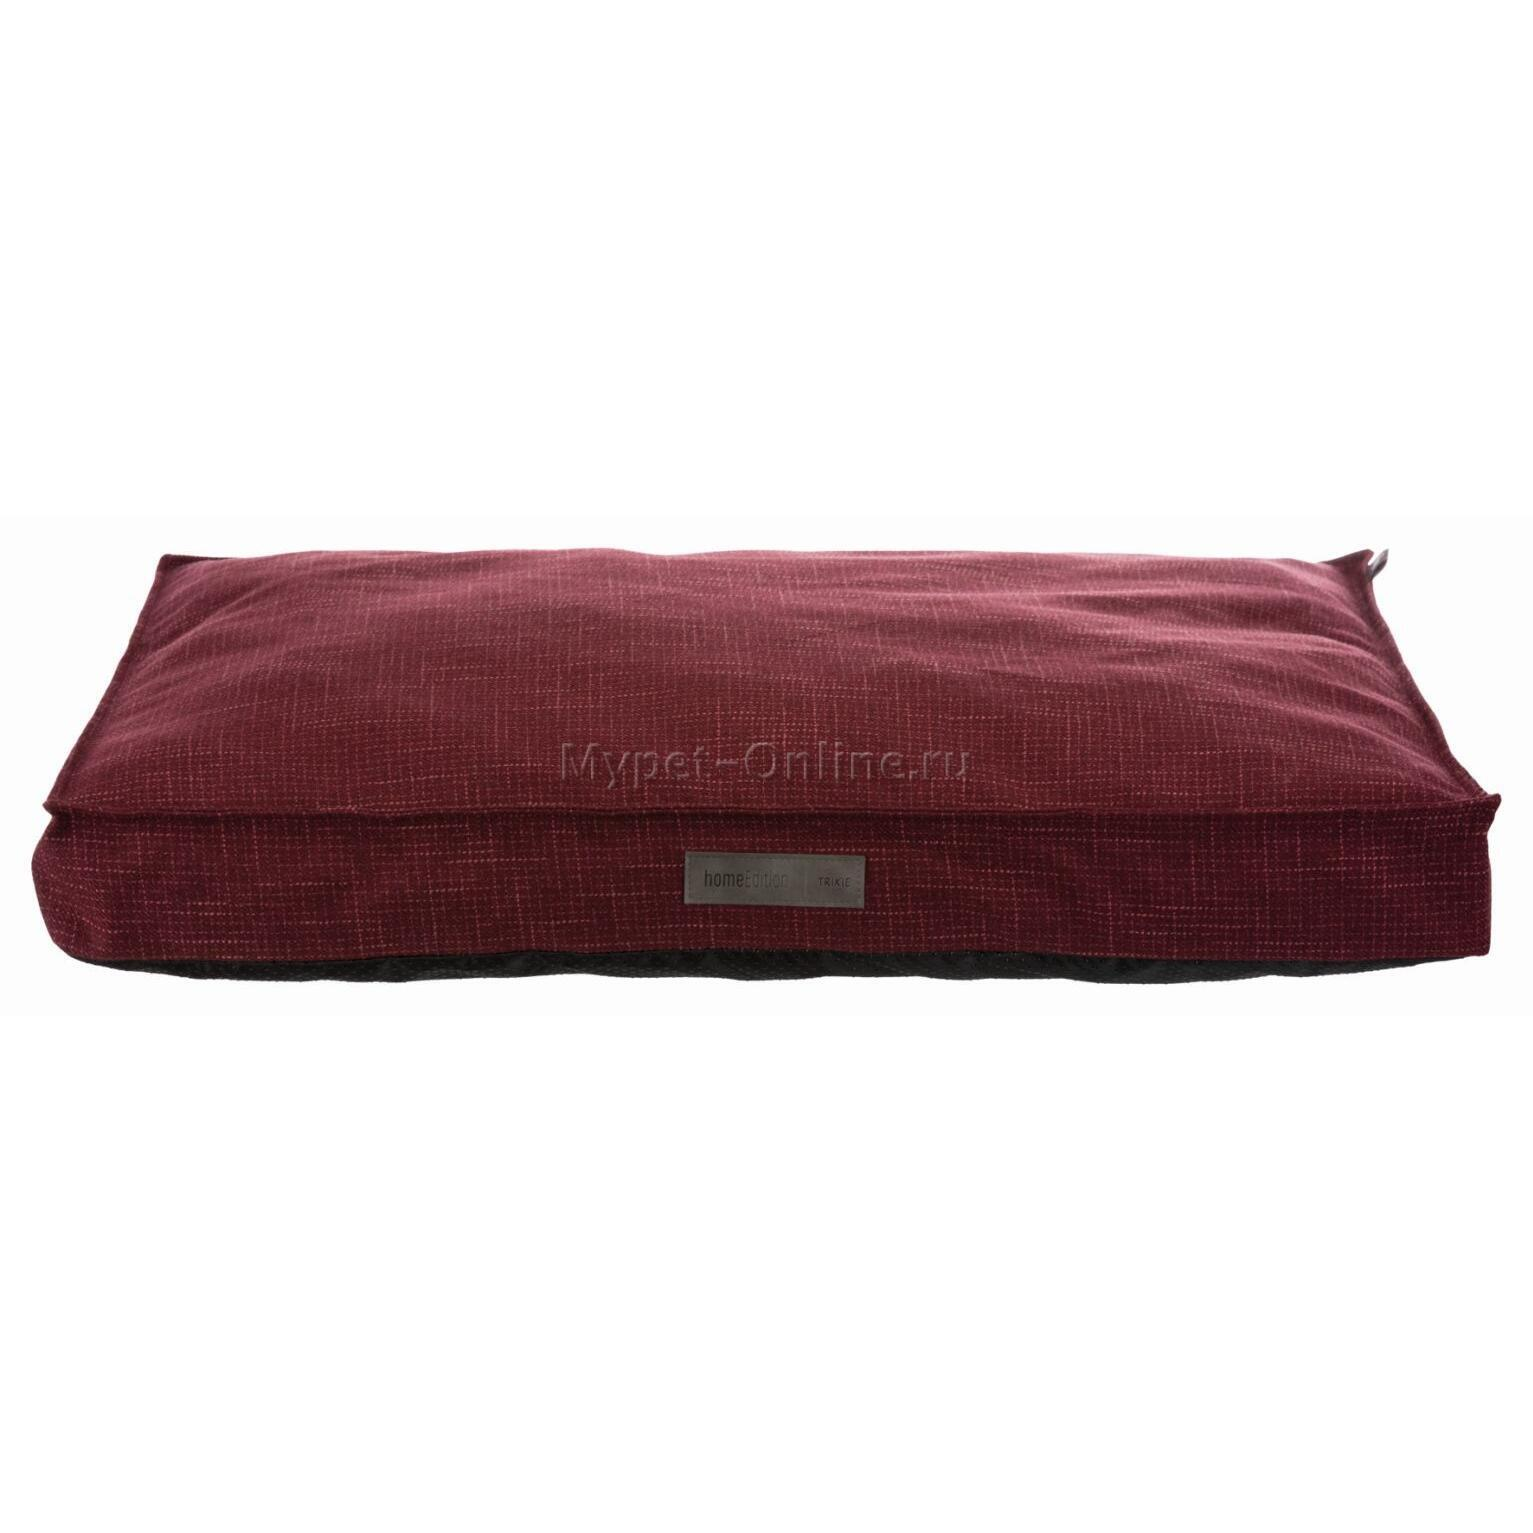 Лежак для собак Trixie Talis, размер 110х80см. - Интернет зоомагазин MyPet-Online.ru